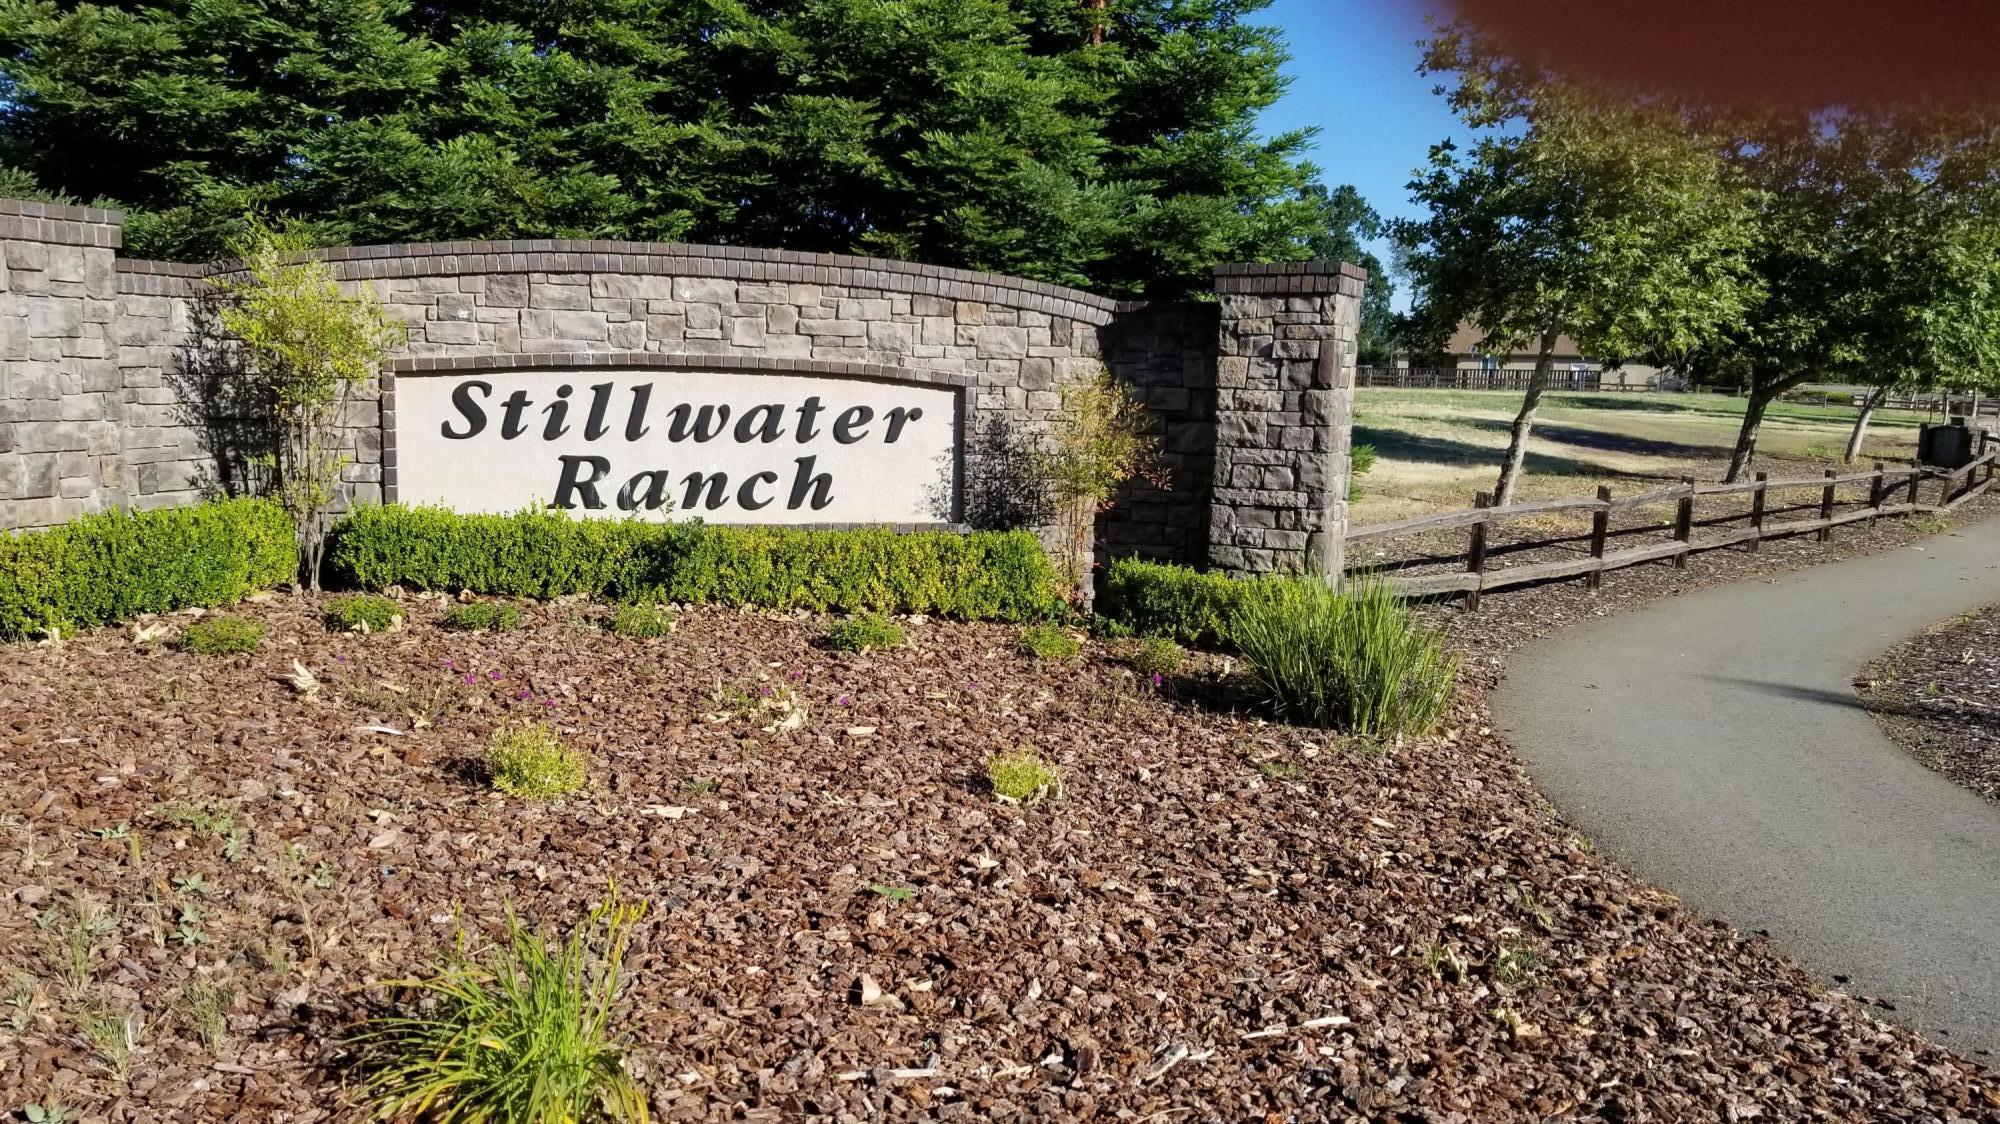 Lot 6,phase 3 Stillwater Ranch, Redding CA 96003 - Photo 1